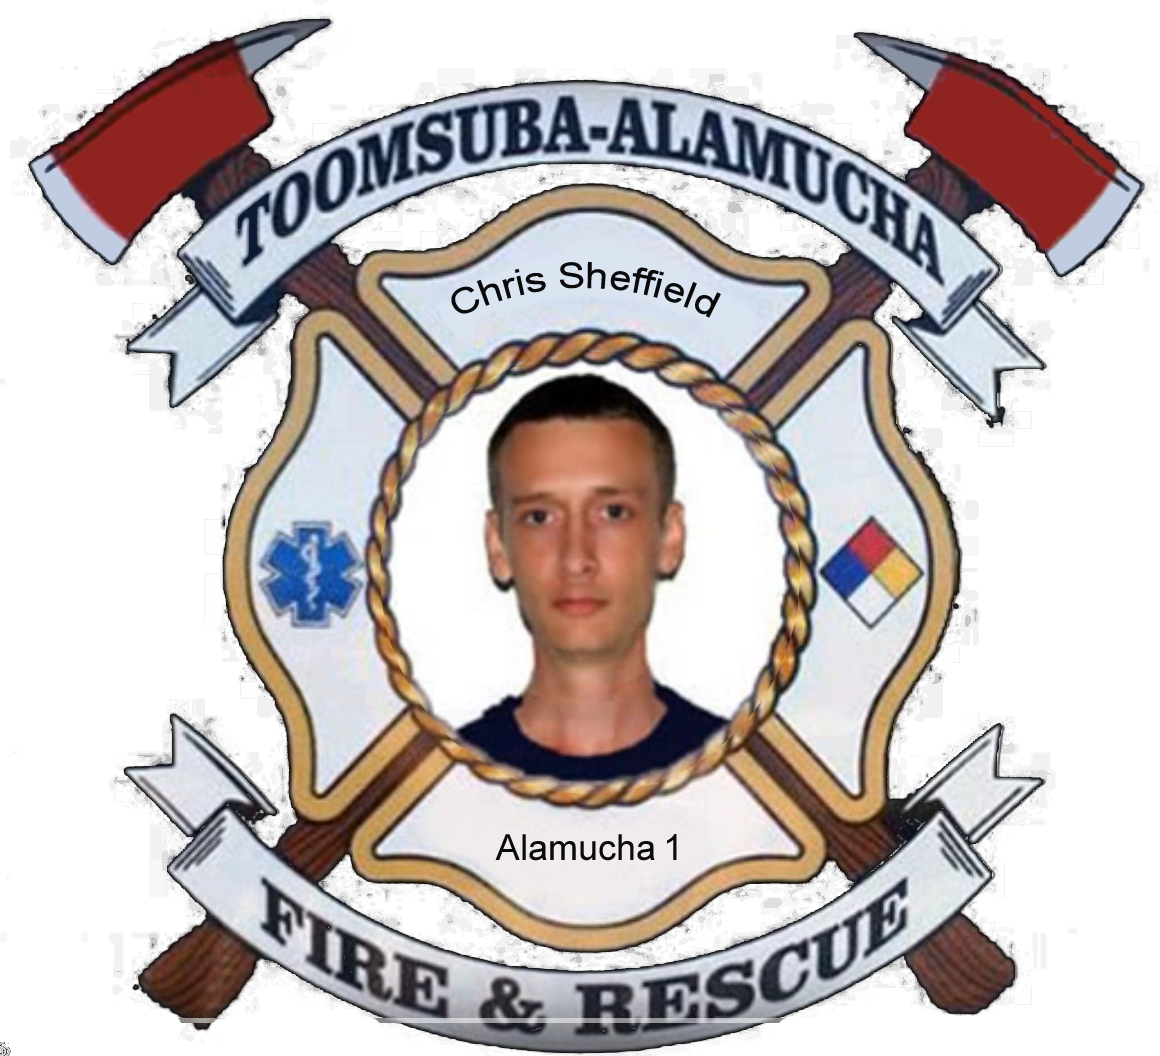 Chris Sheffield; Alamucha Firefighter #1